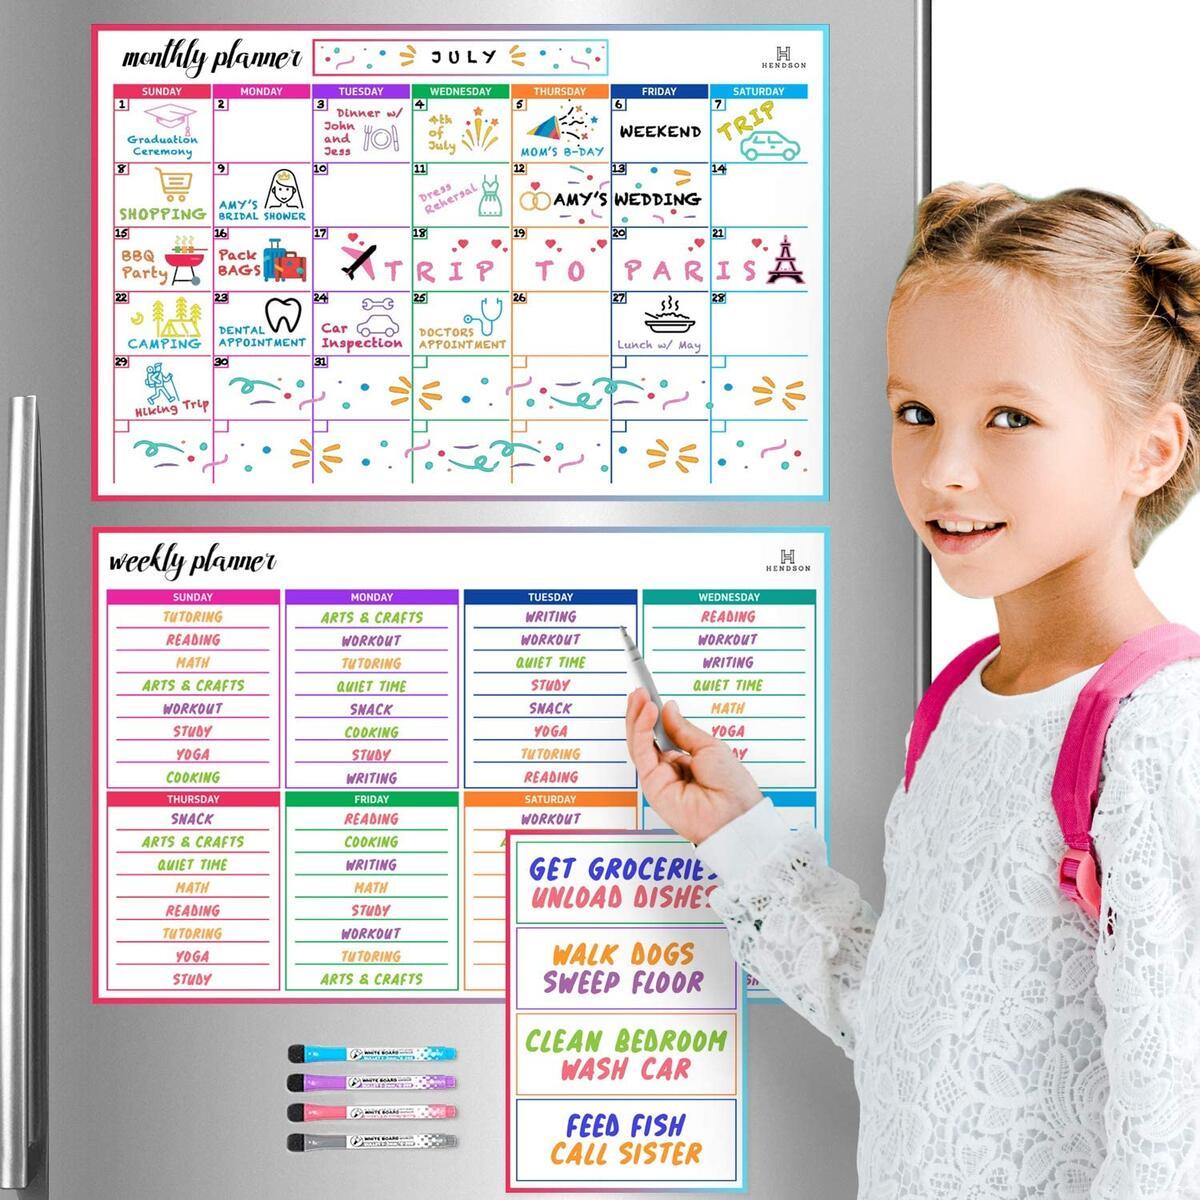 Magnetic Dry Erase Calendar Whiteboard - Set of 3 Magnetic Calendars for Refrigerator: Monthly Planner (11